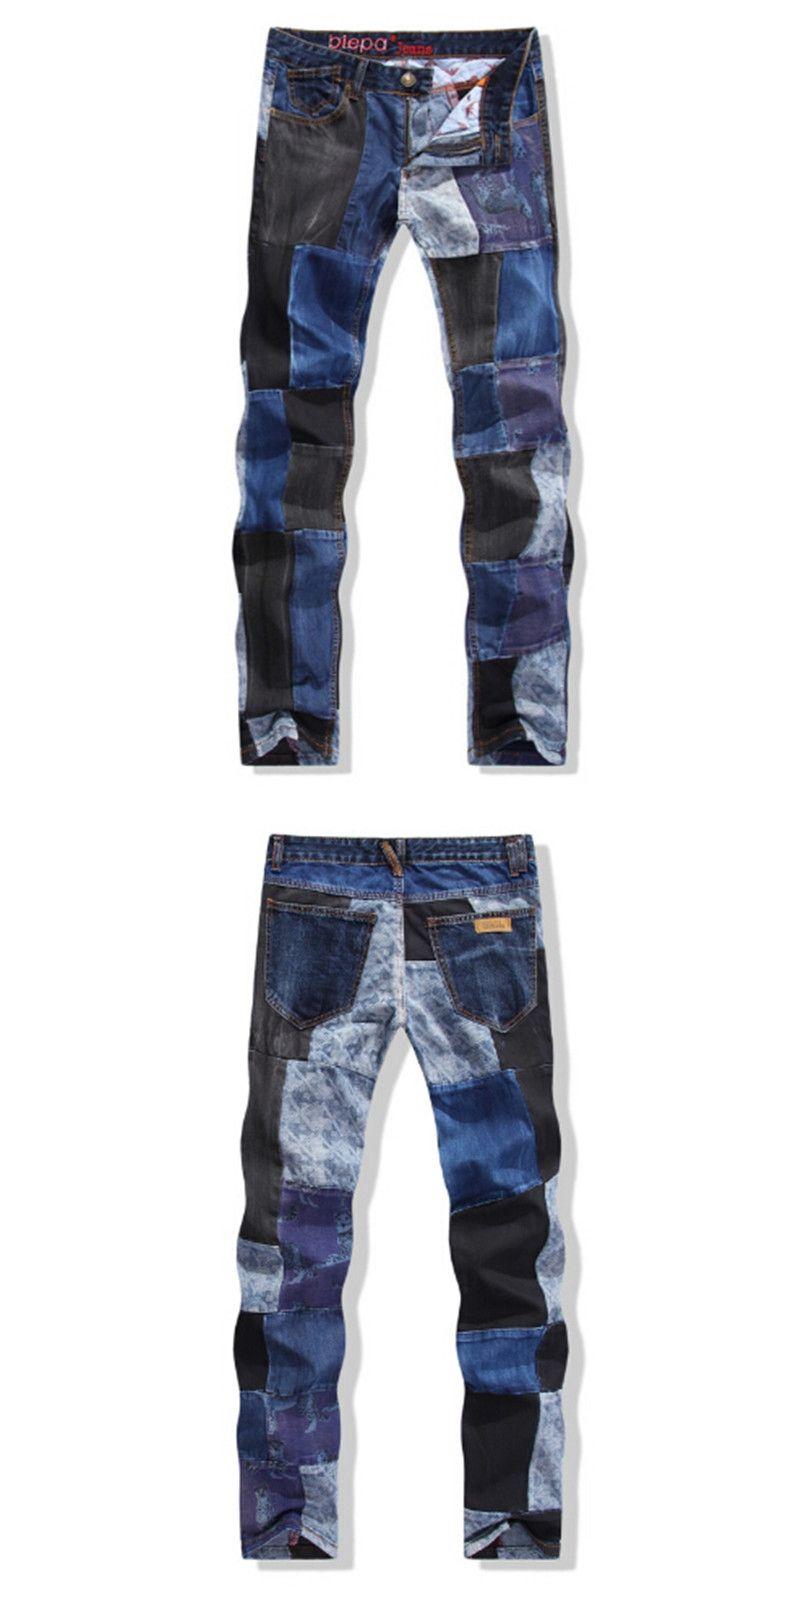 The new European menus winter straight jeans slim jeans wholesale